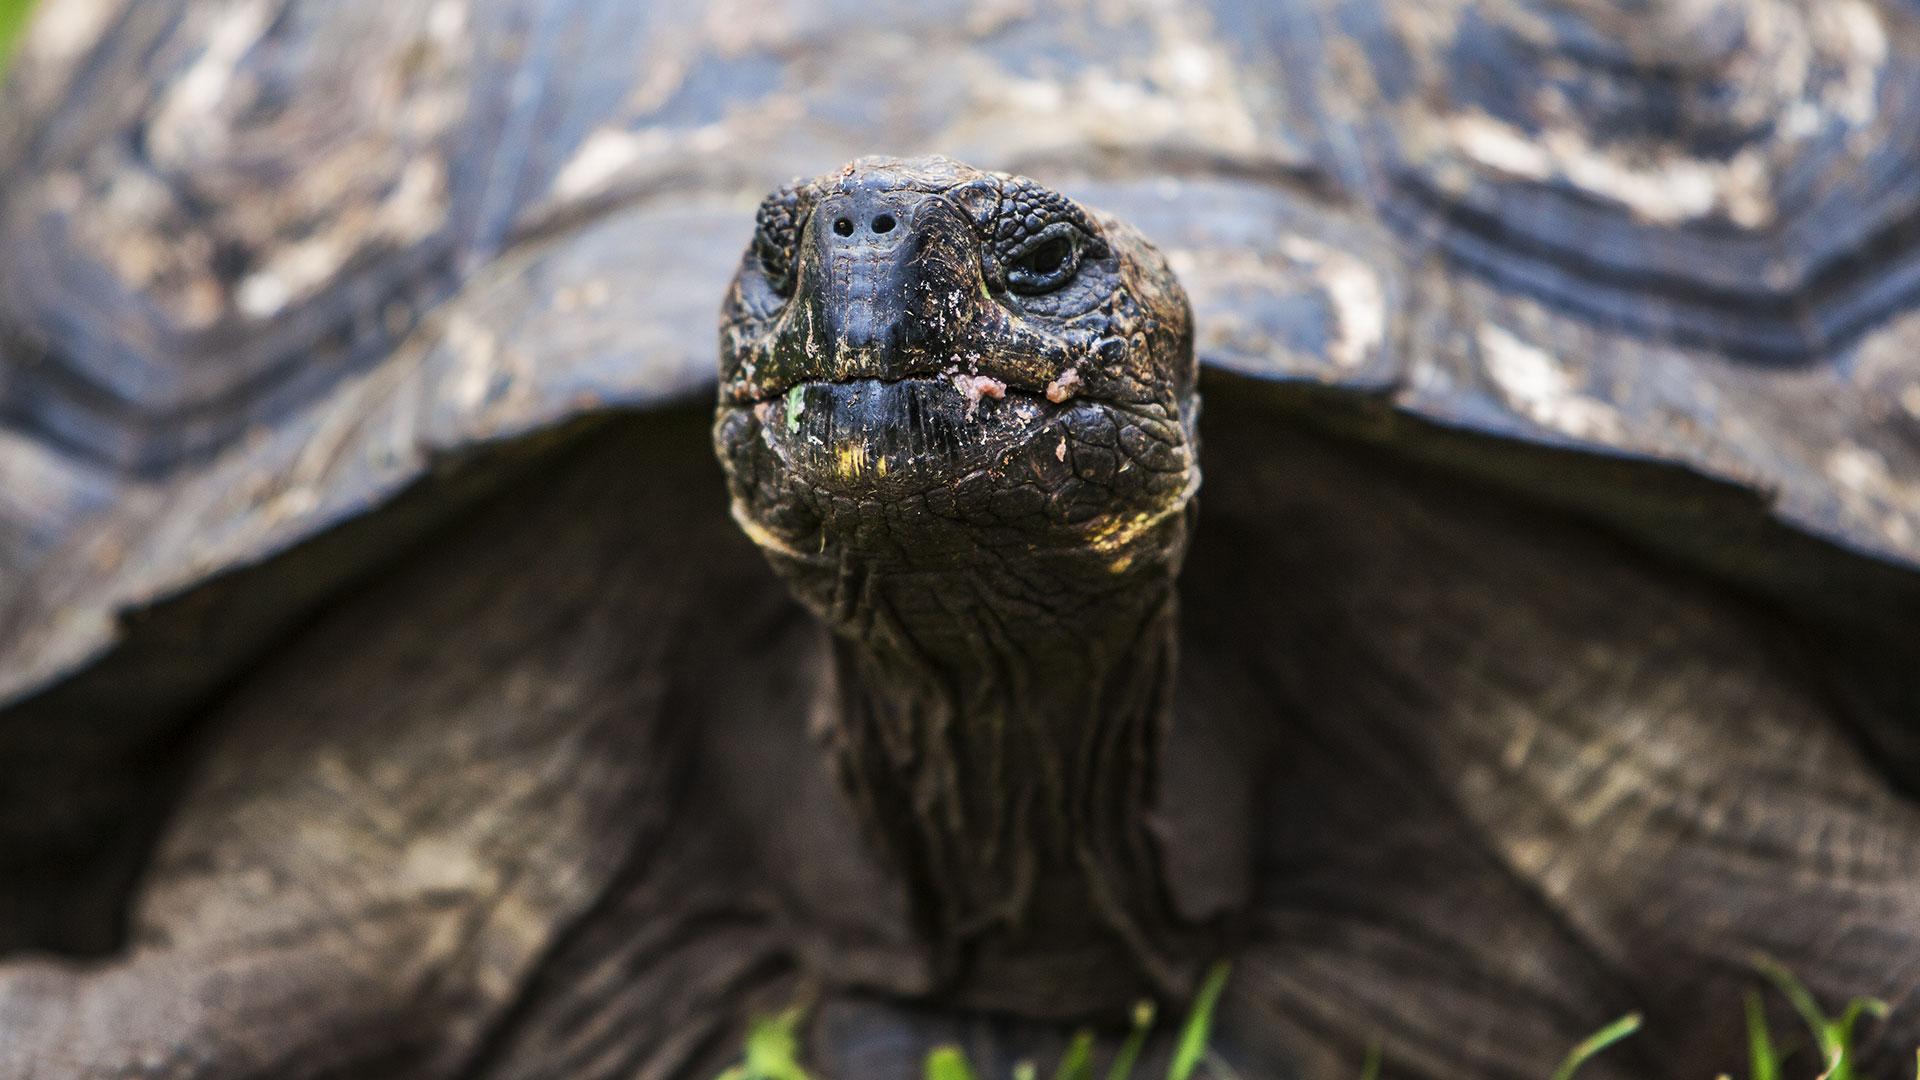 Galapagos Giant Tortoise in Santa Cruz Island - Galpagos